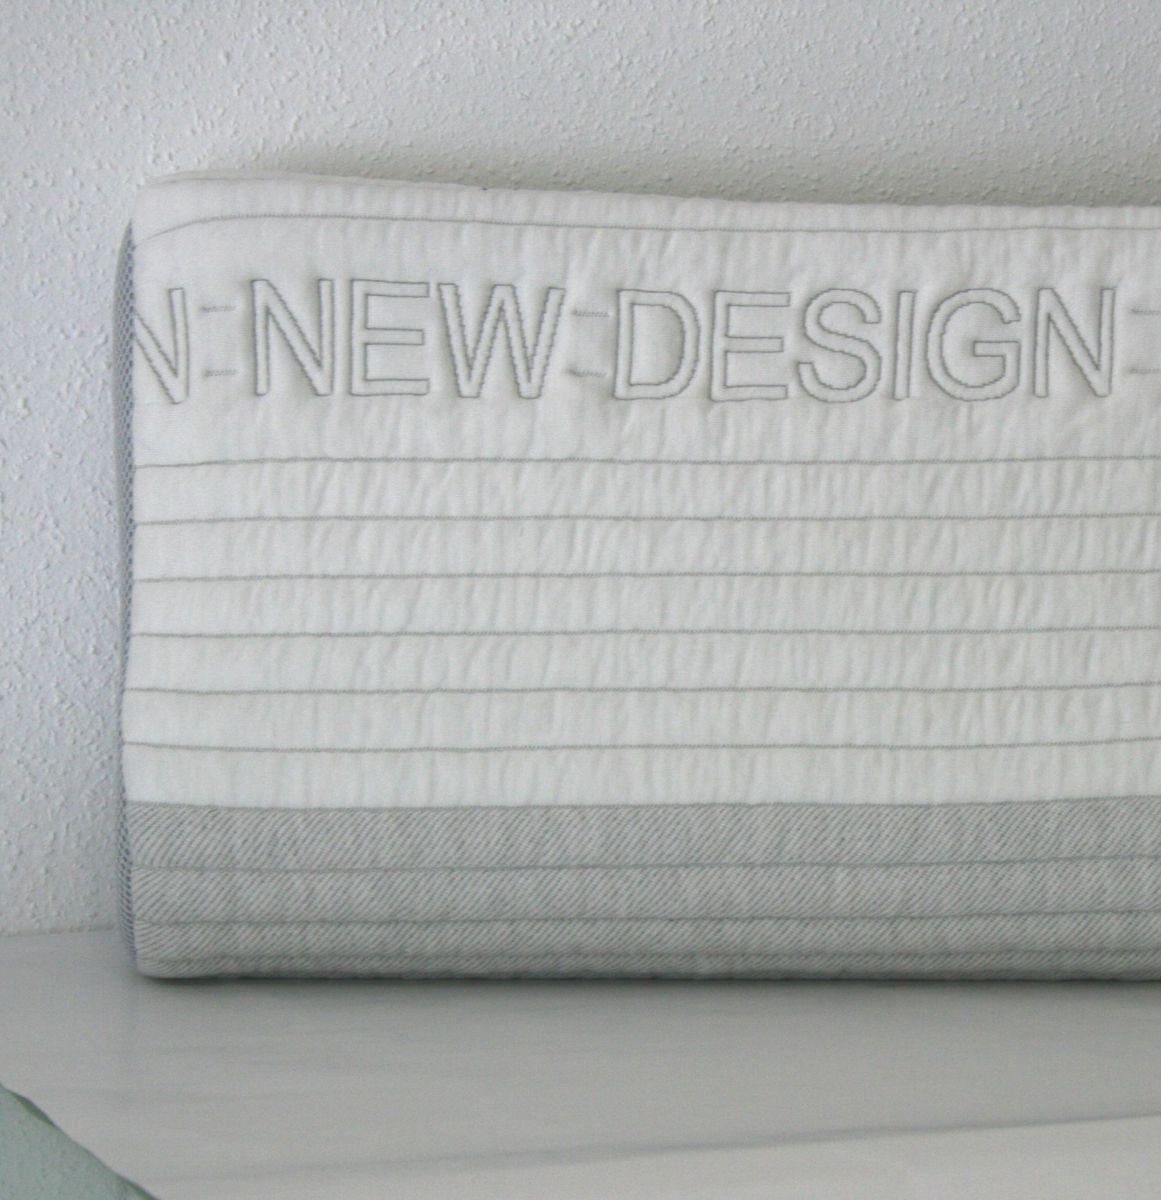 Nackenstützkissen New Design Premium – Talalay-Latex – Bild 3